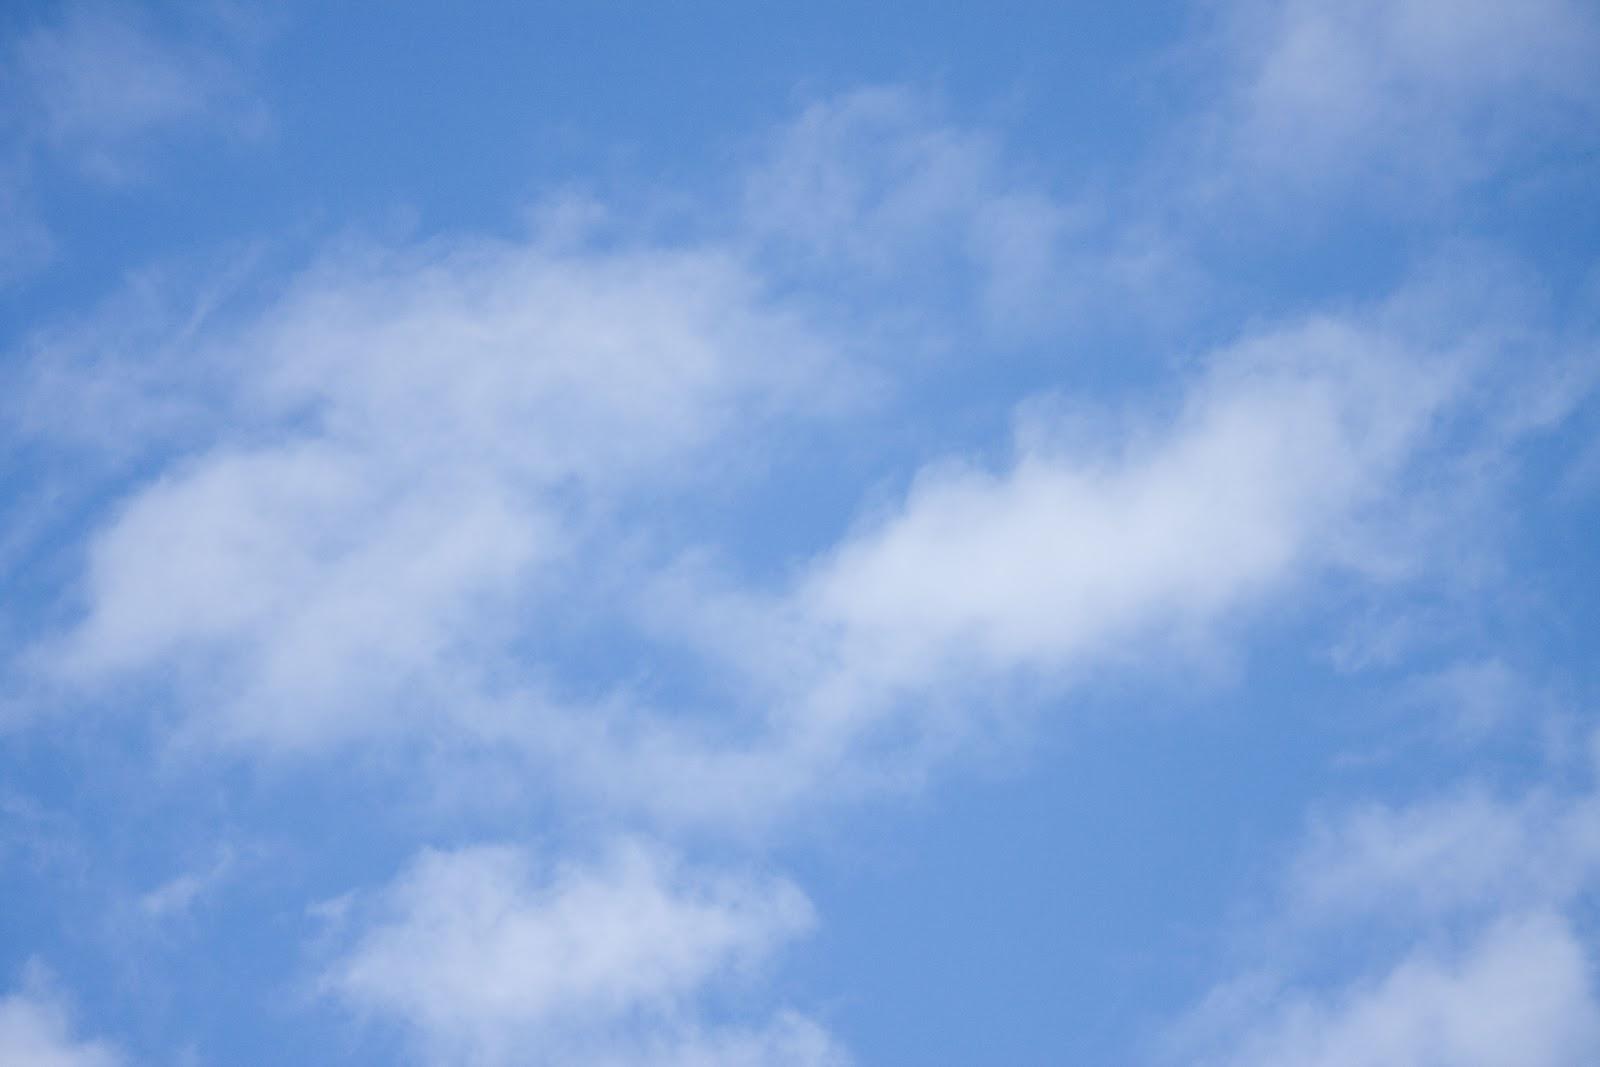 mountains sky light clouds - photo #41